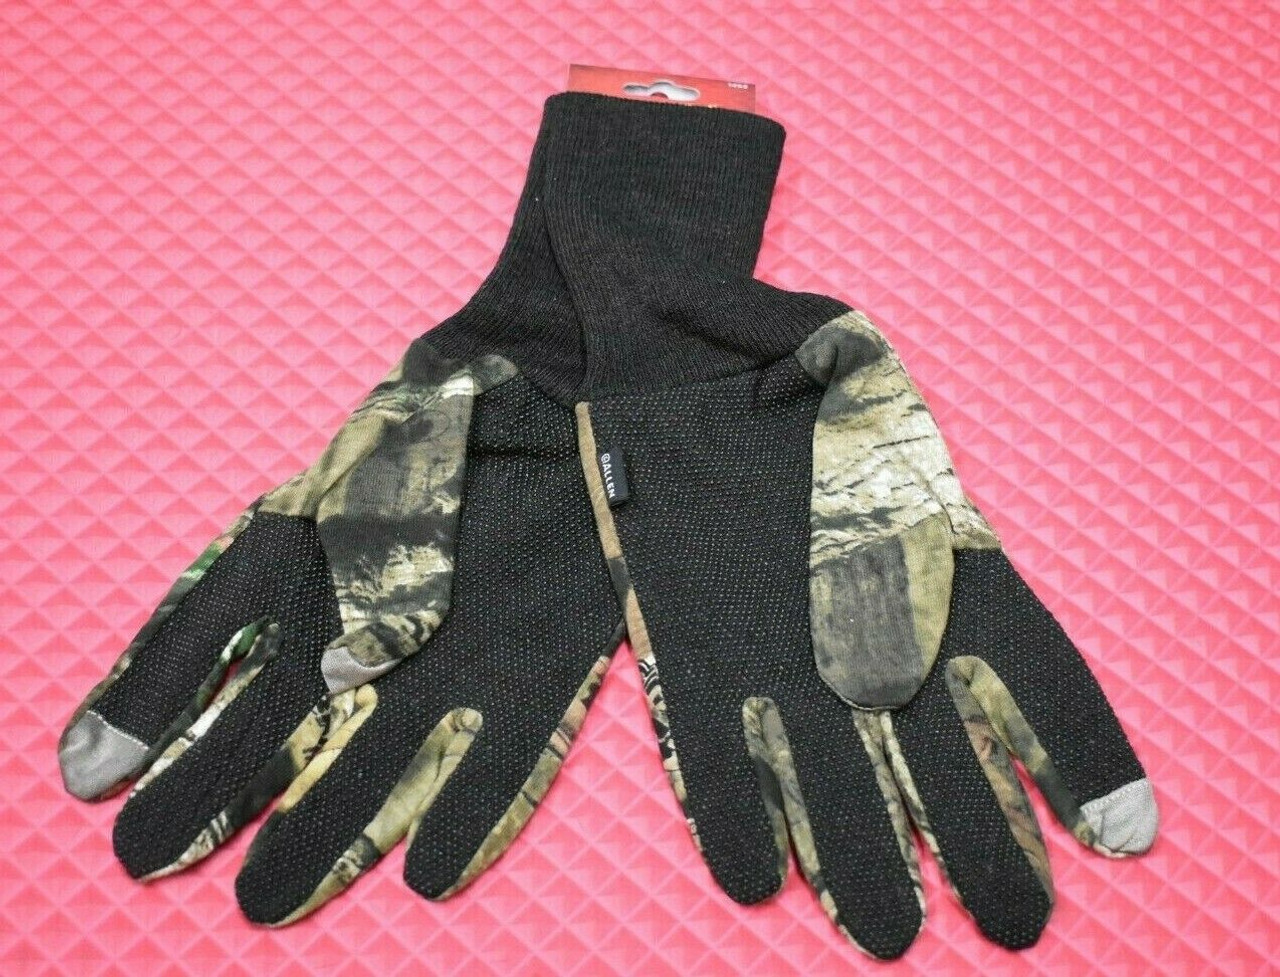 ALLEN Dot Grip Touchscreen Fingertip Jersey Gloves Mossy Oak Break Up #1453